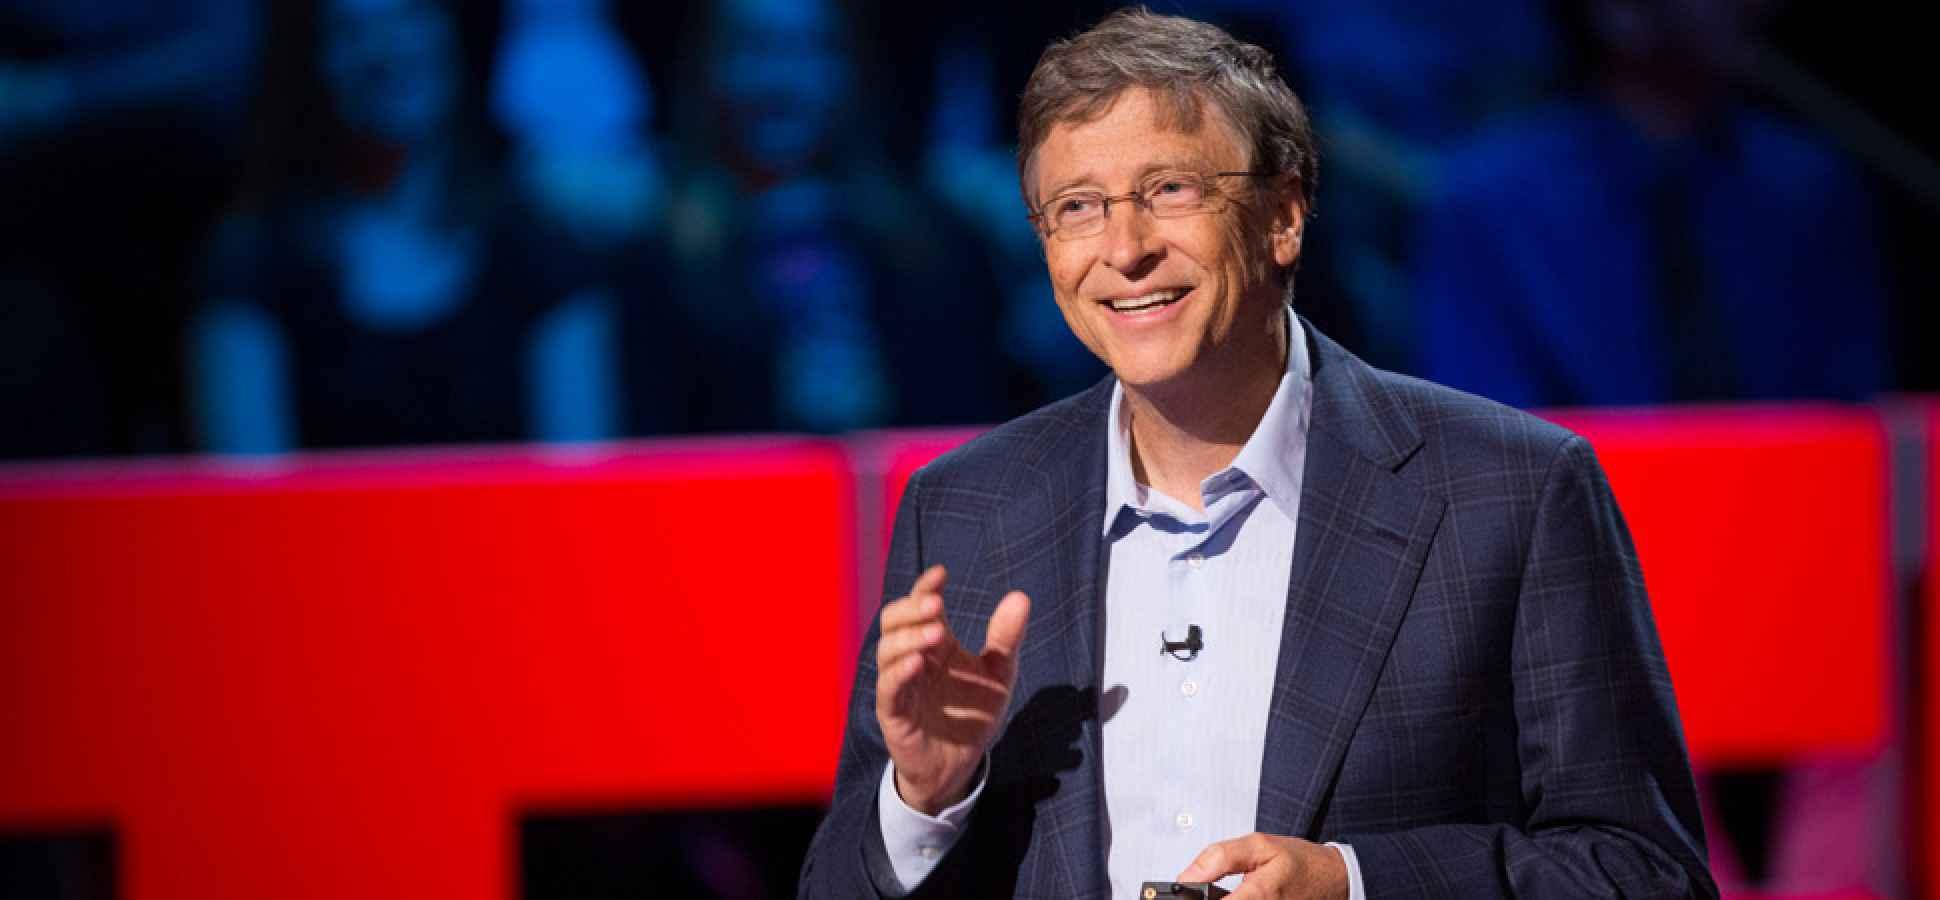 Top 10 TED Talks for Entrepreneurs